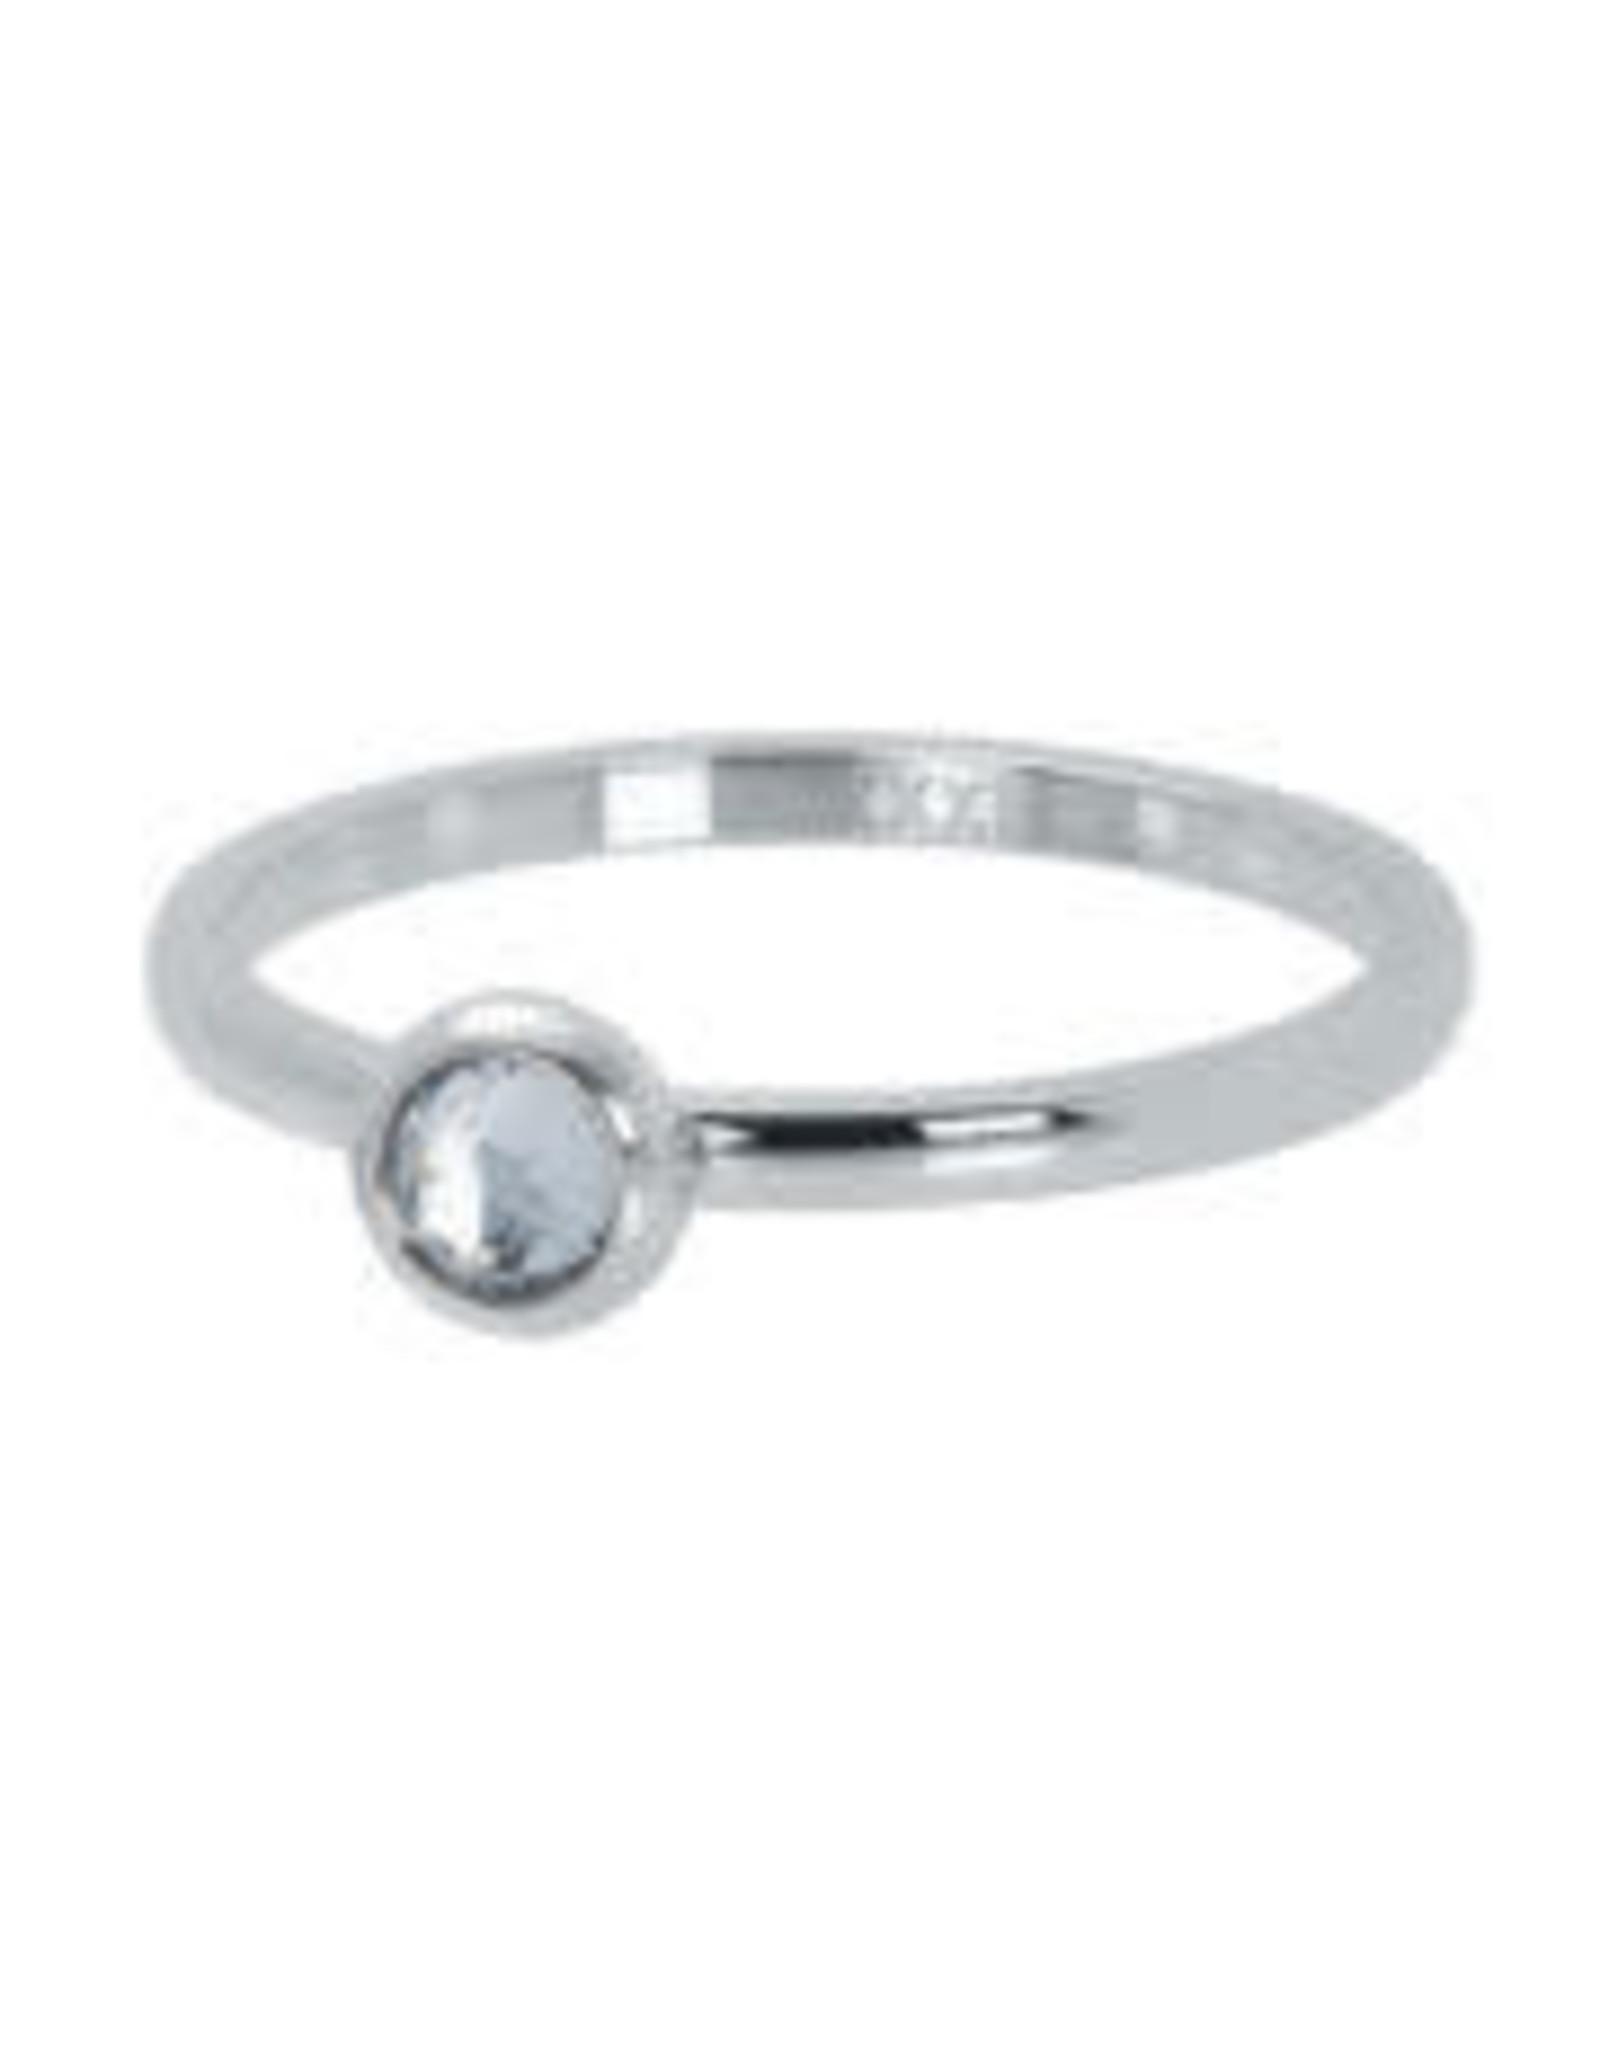 IXXXI IXXXI 1 Zirconia ring Silver